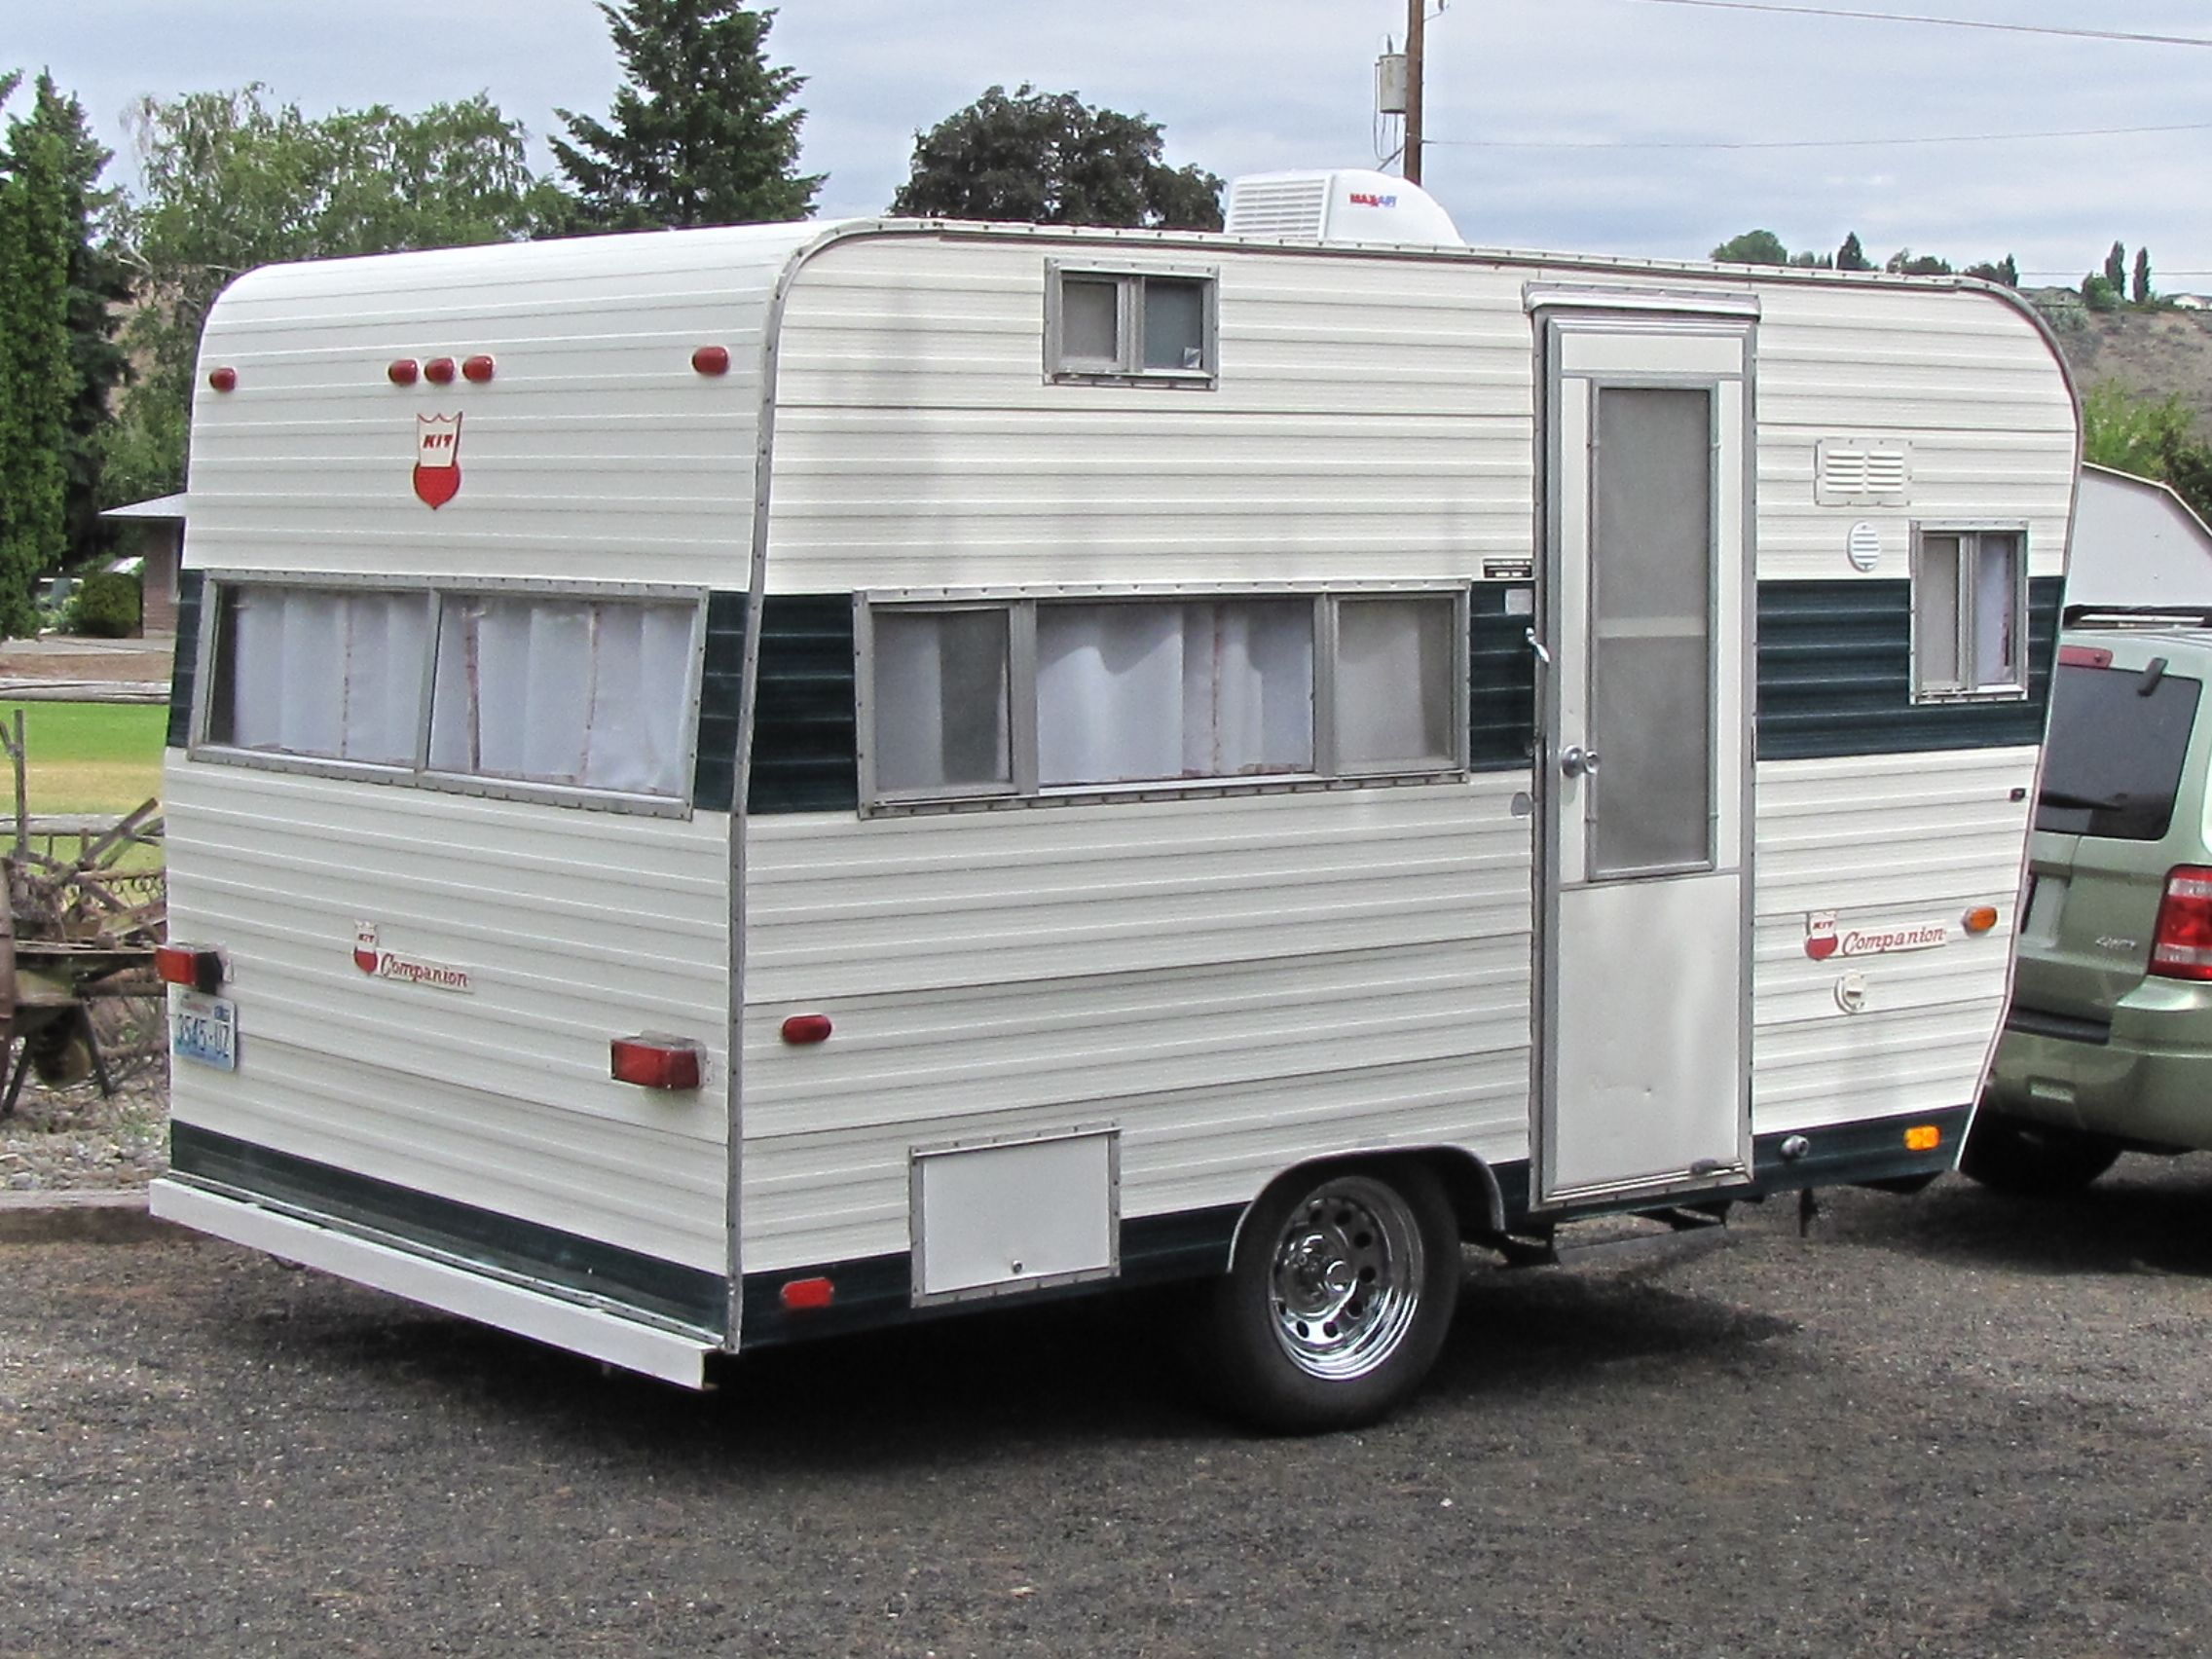 Our 1970 Kit Companion vintage trailer. Trailer Diy, Vintage Travel Trailers,  Vintage Campers